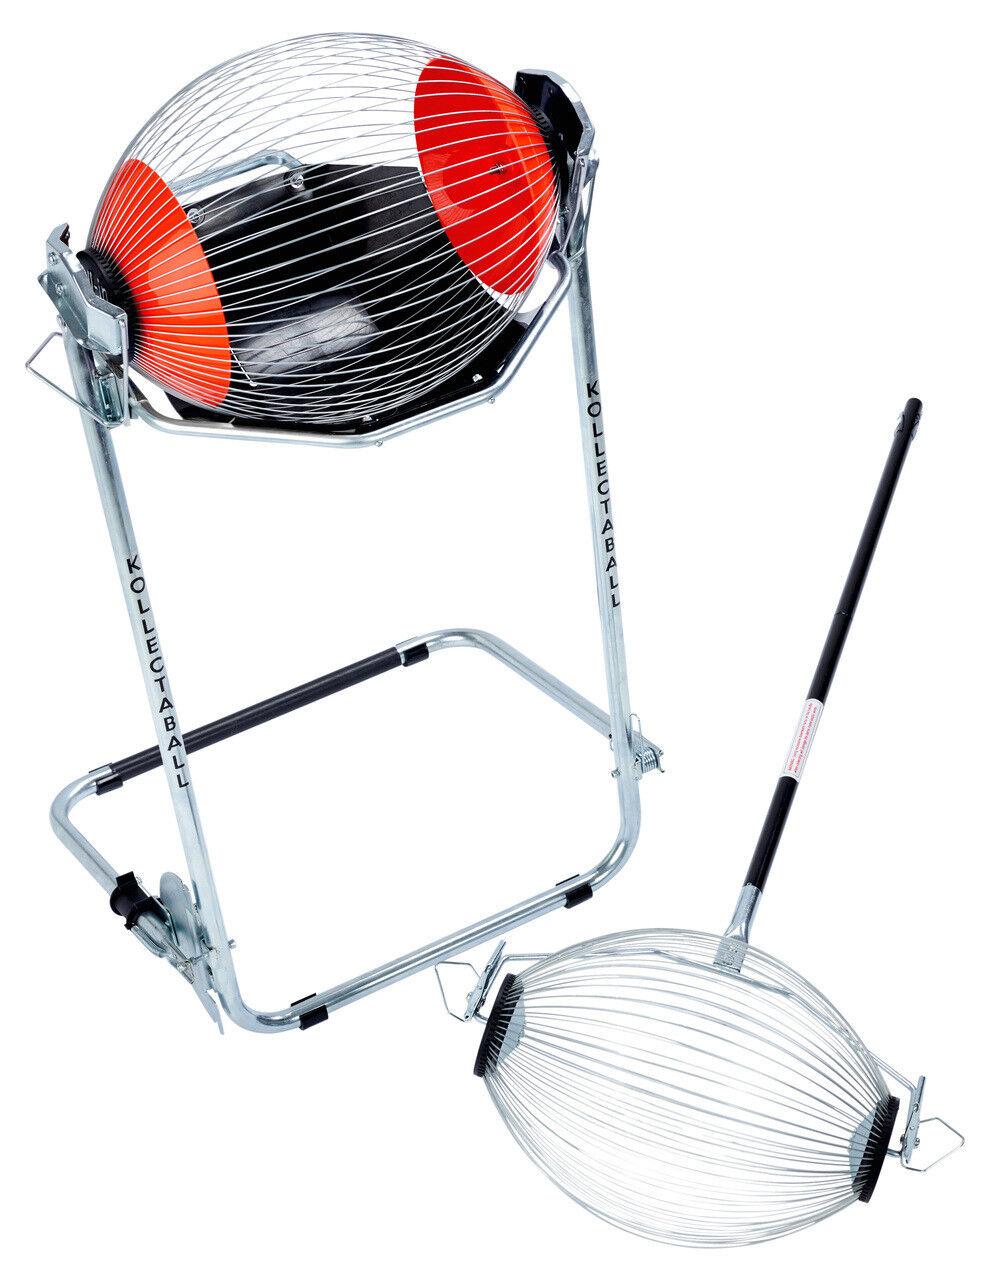 Palla da Tennis kollectaball collezionista, feeder & Sweeper